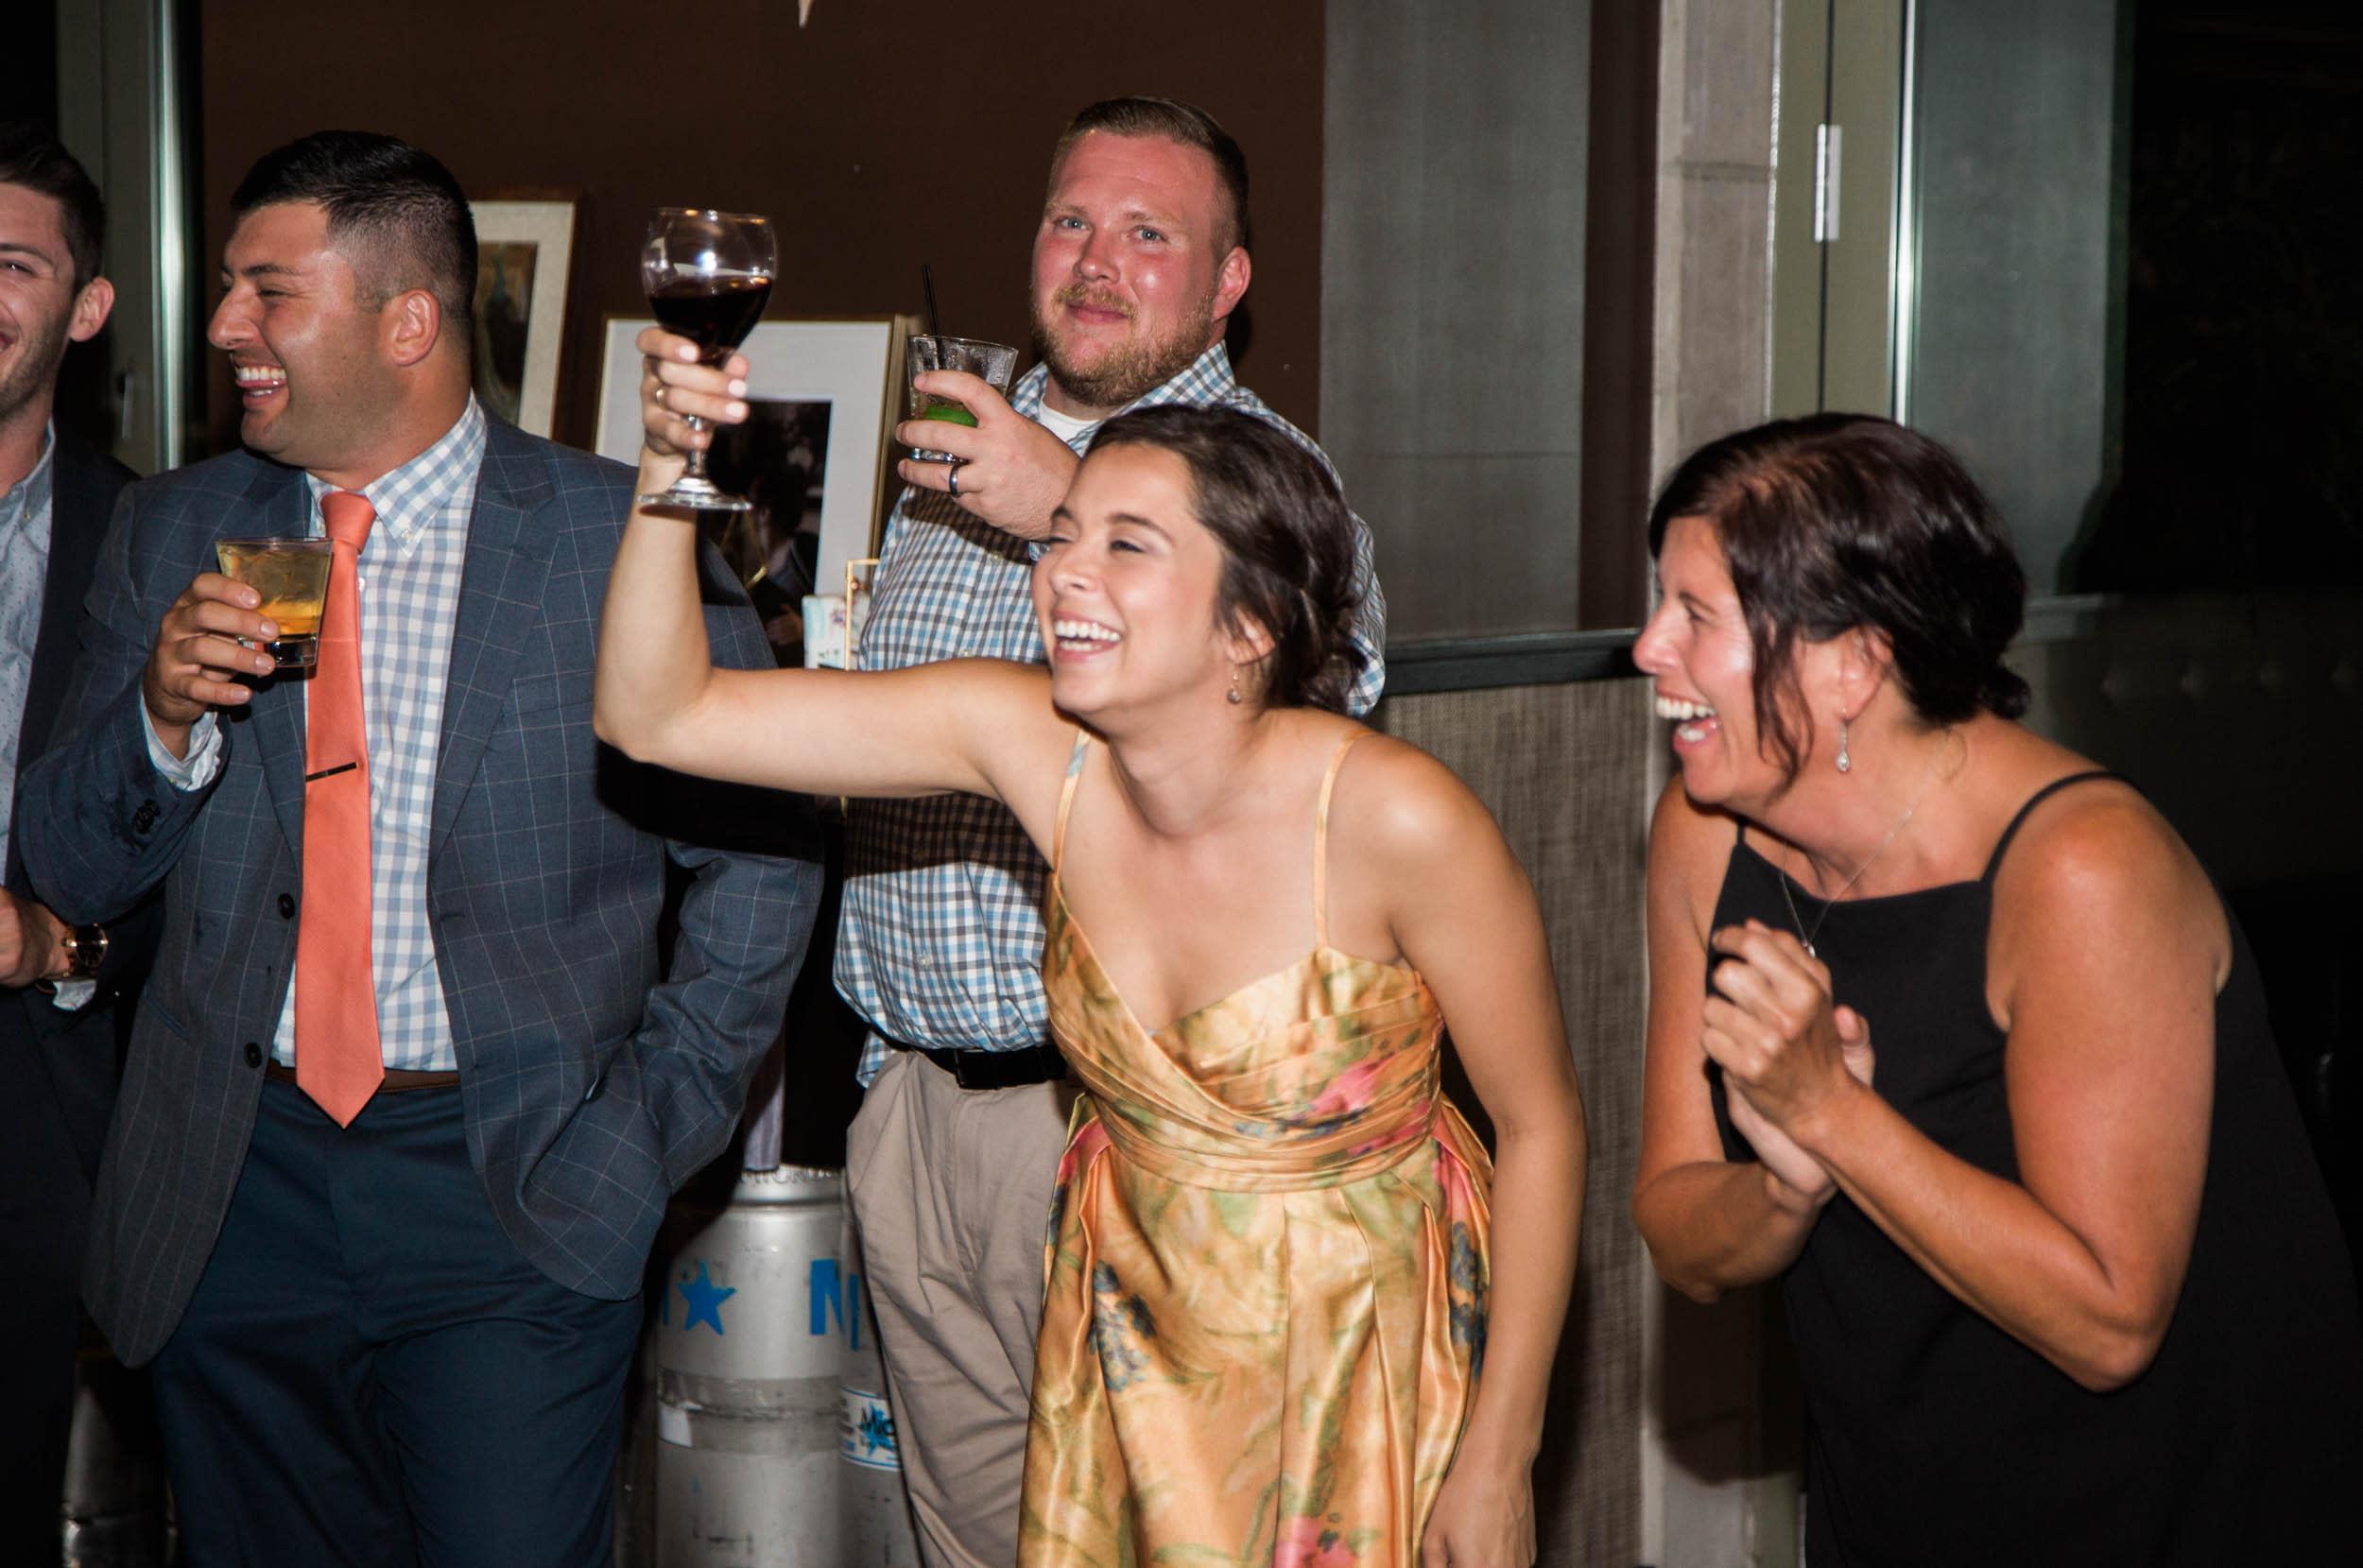 Chicago Wedding- Toasts